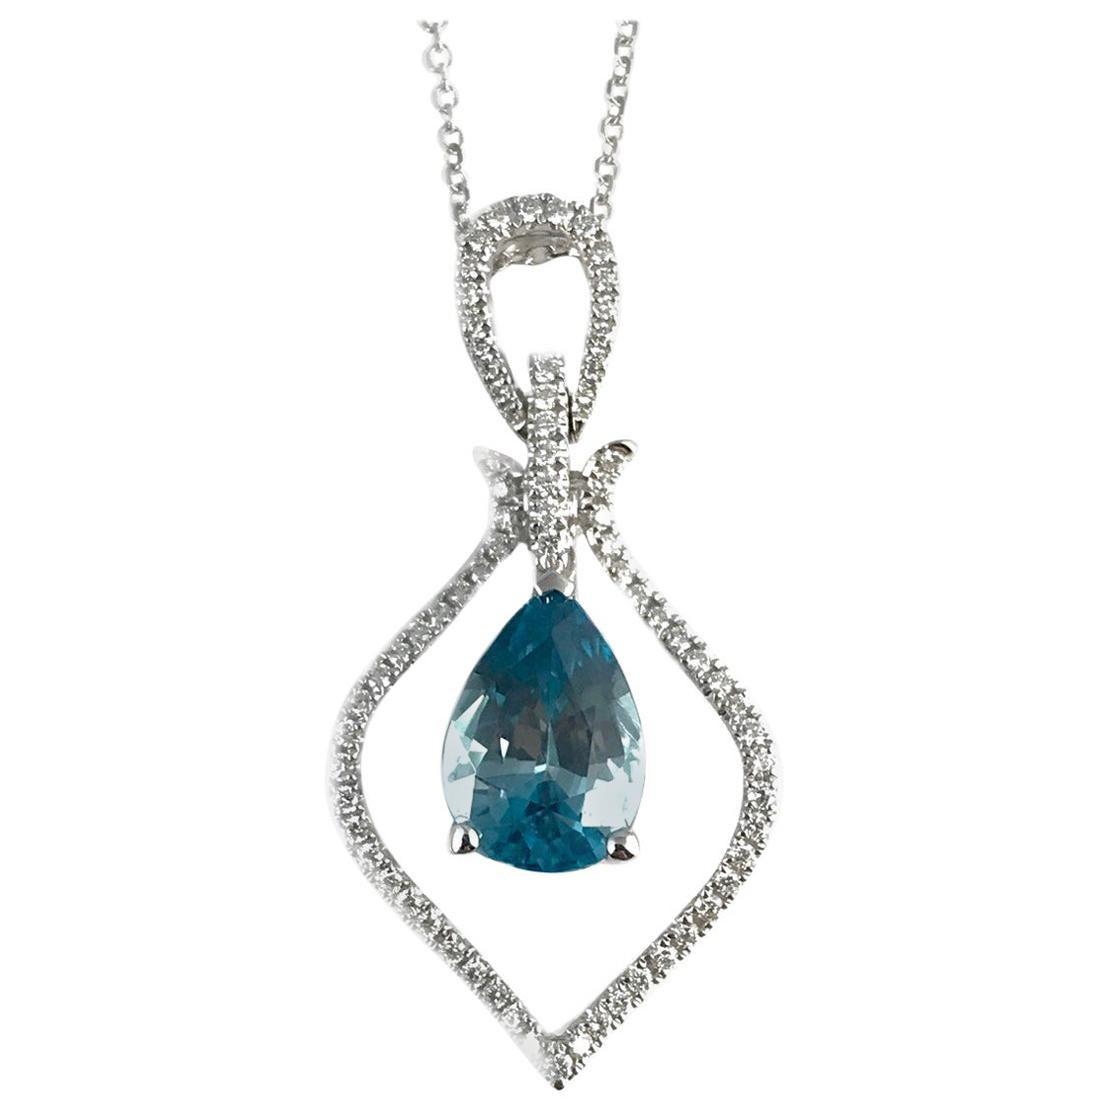 DiamondTown 2.87 Carat Pear Shaped Blue Zircon and Diamond Pendant